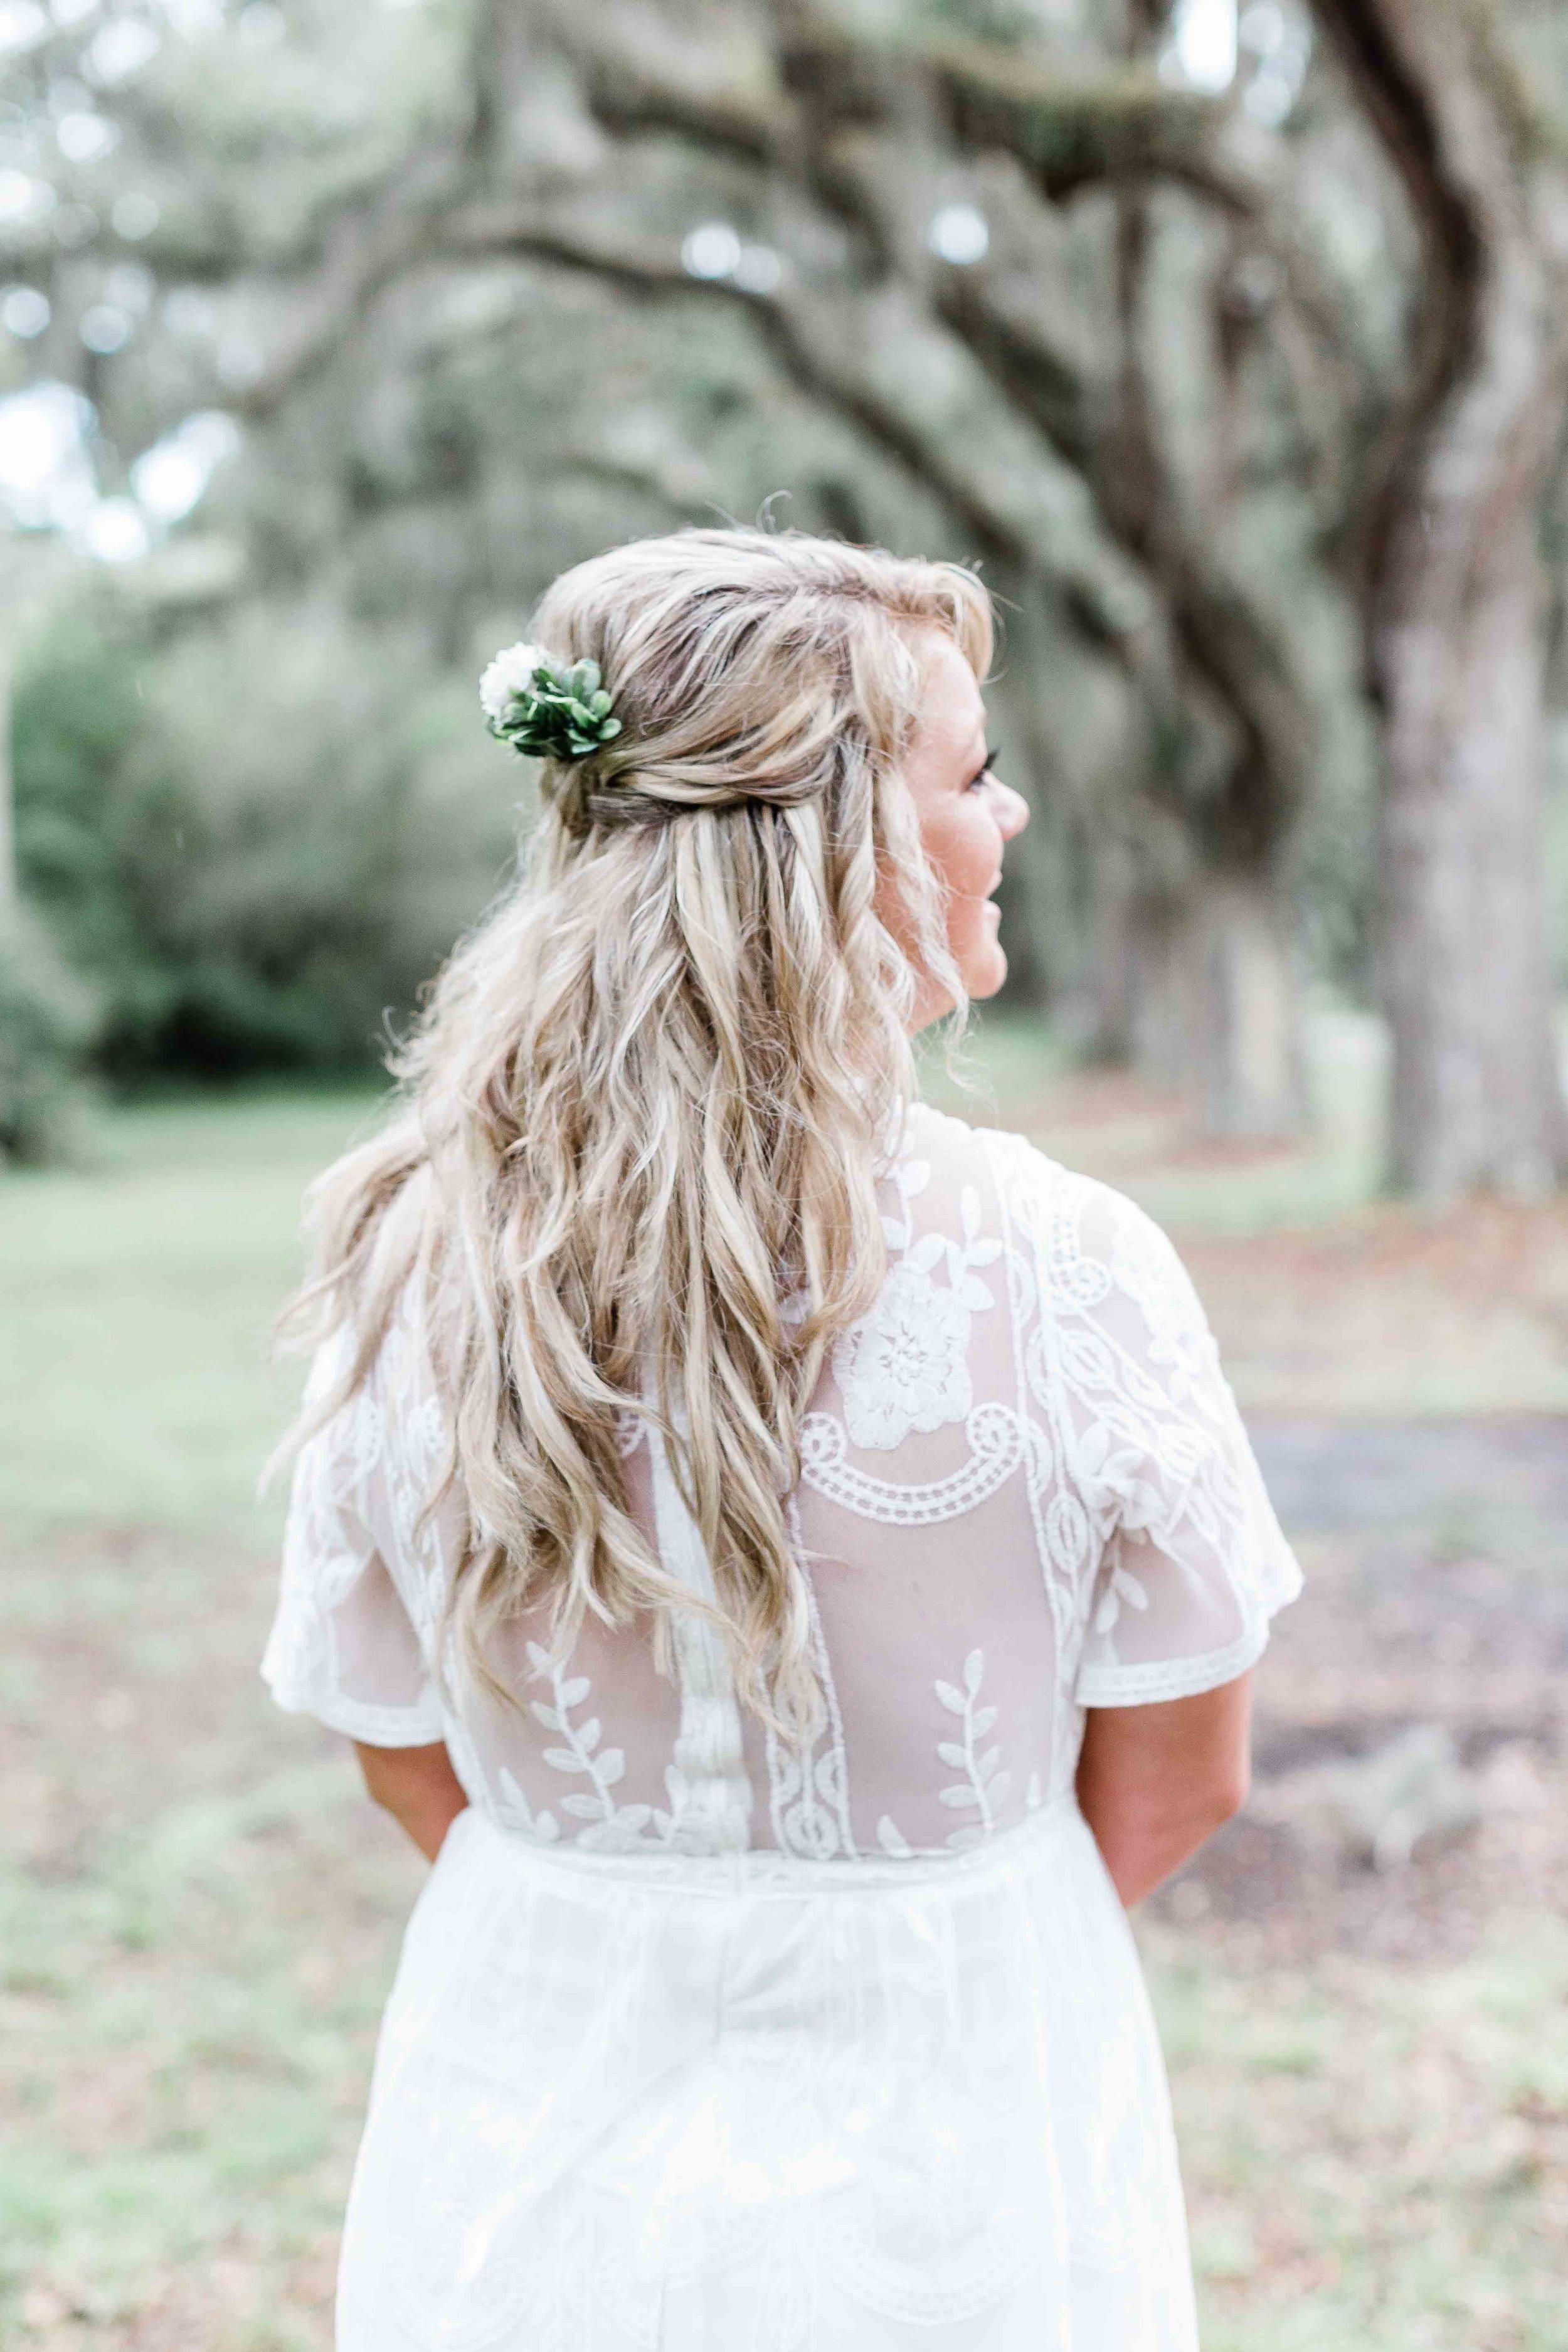 20190727Georgia-Wormlsoe Plantation-Simply Eloped-Savannah Wedding Photographer- Southern Lens Photography34.jpg